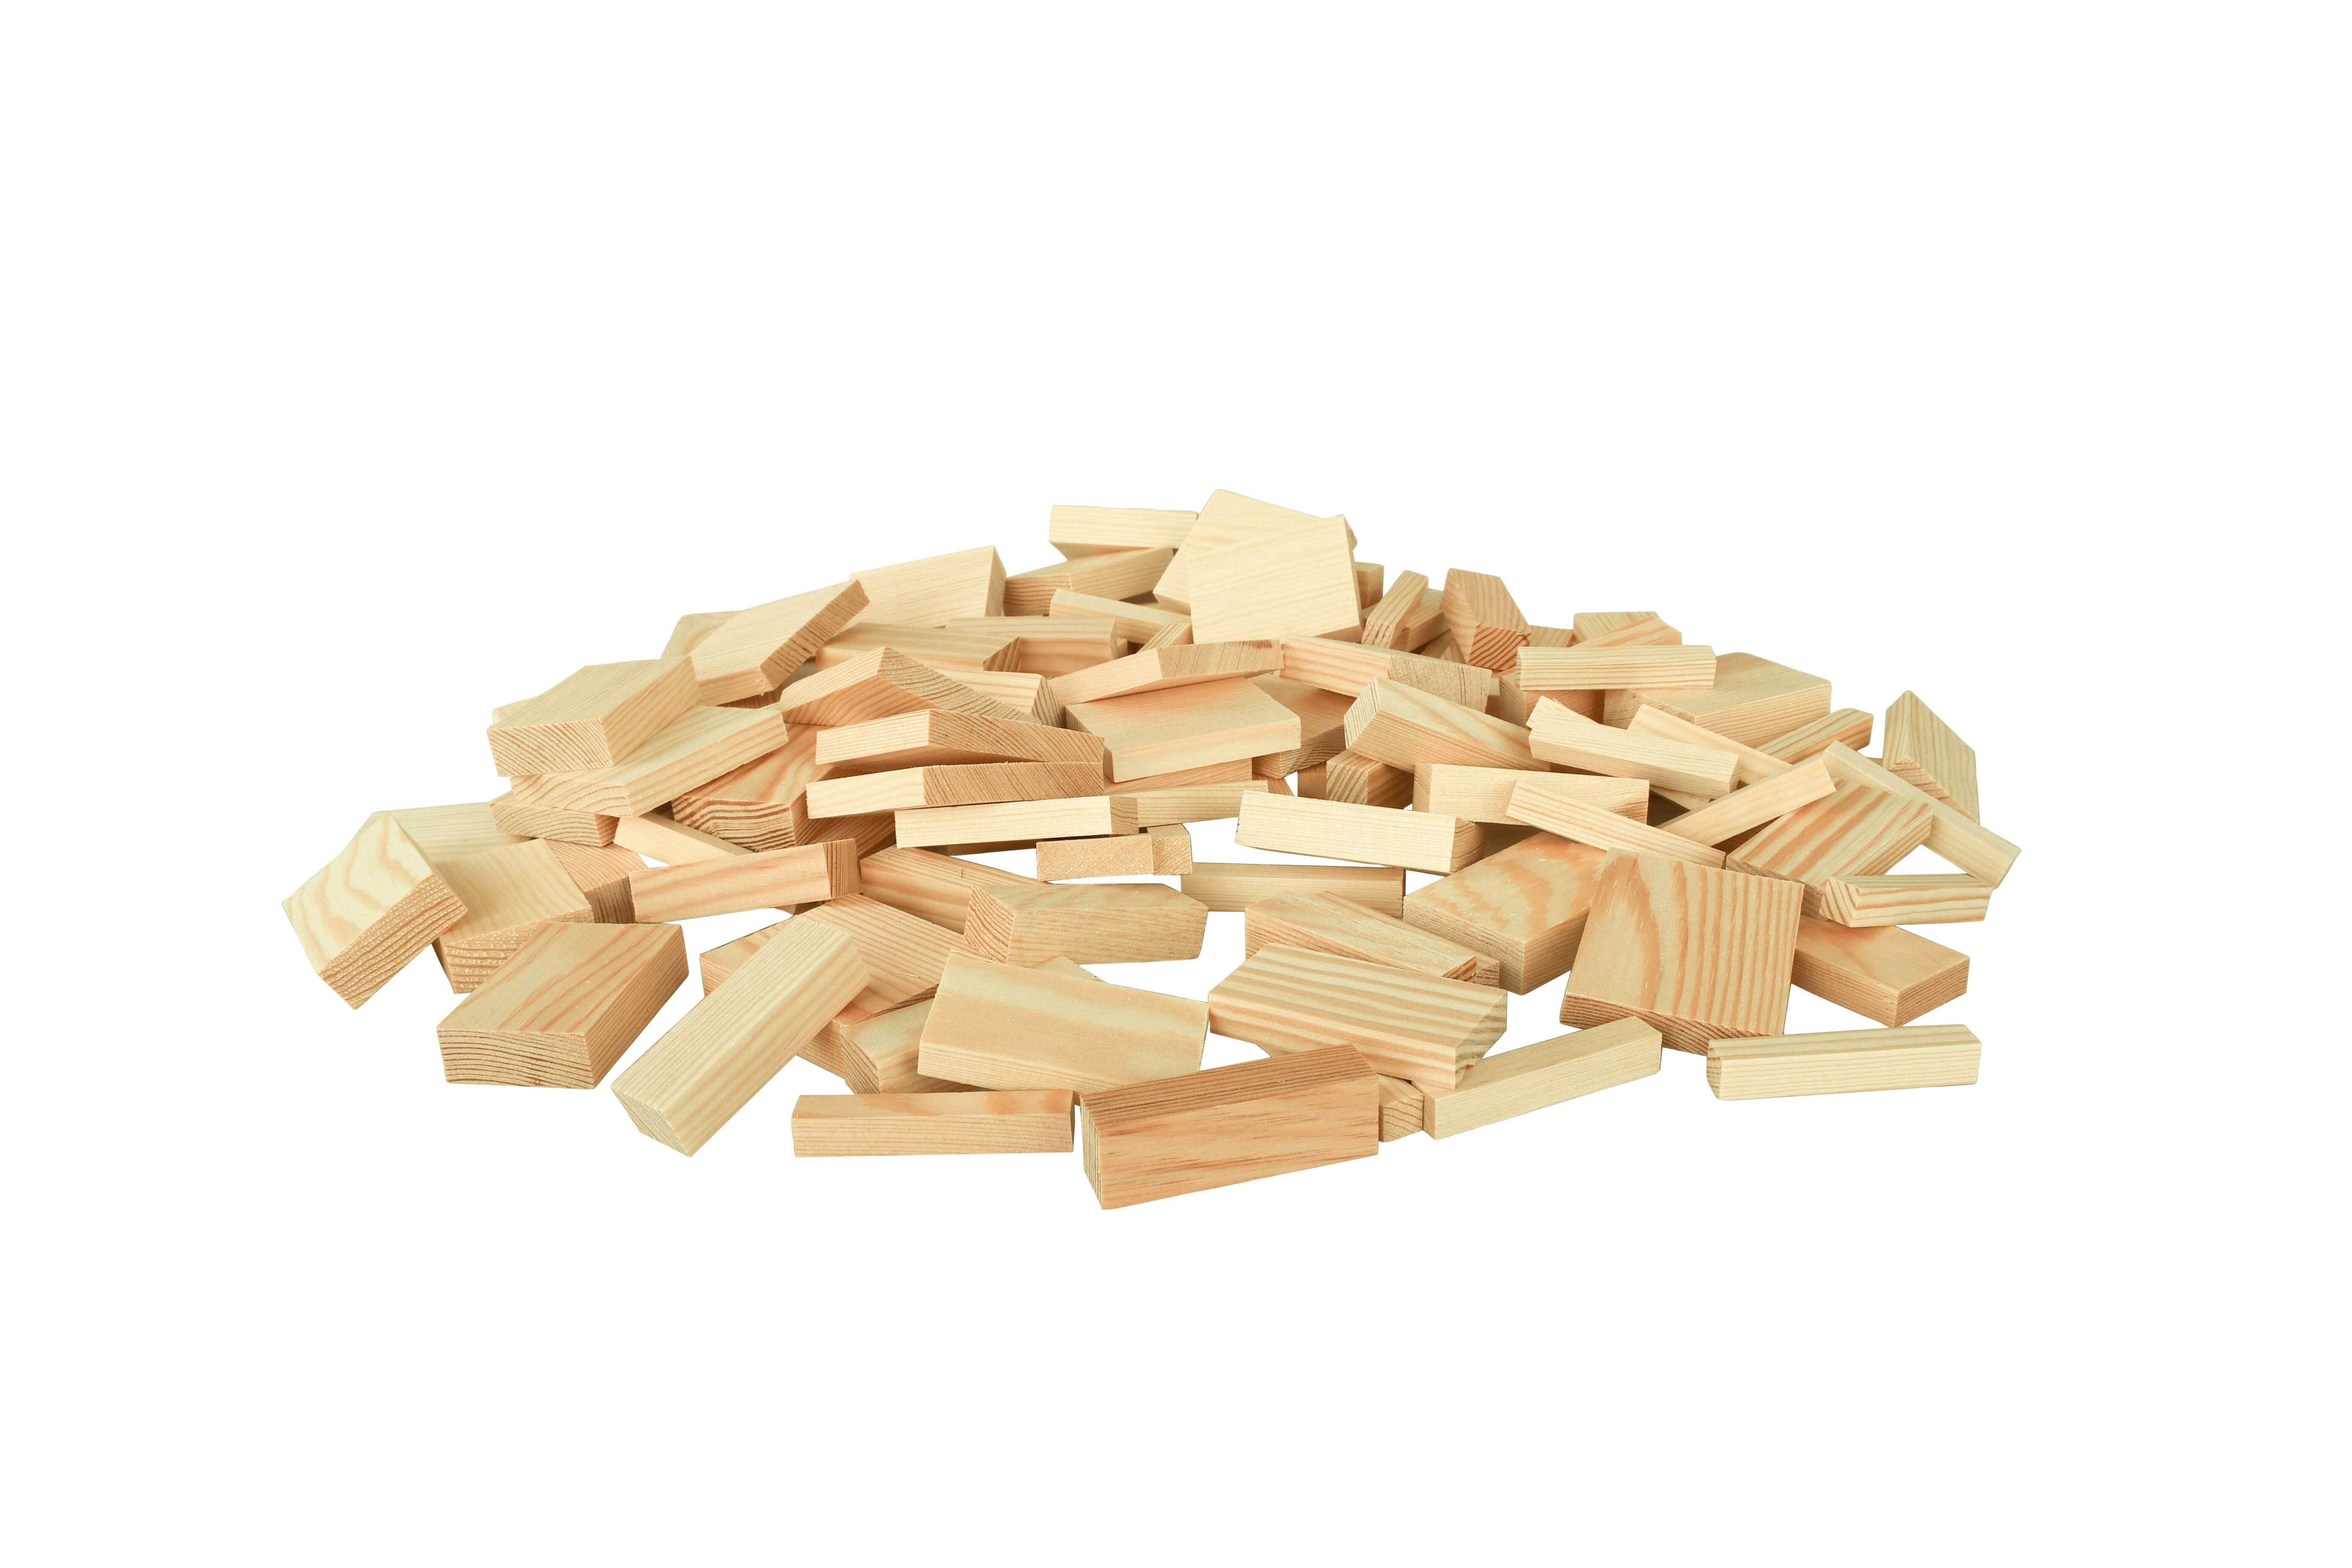 Blocs de bois de pin - 1 kg